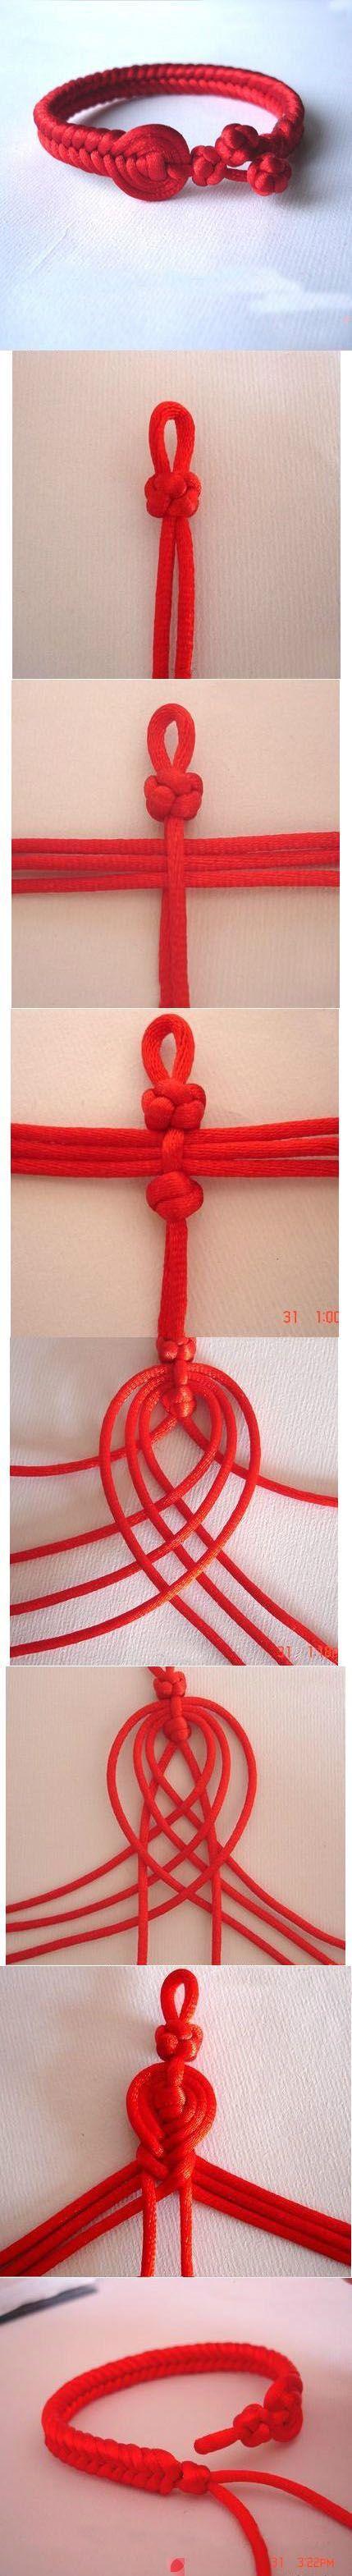 braided bracelet.: